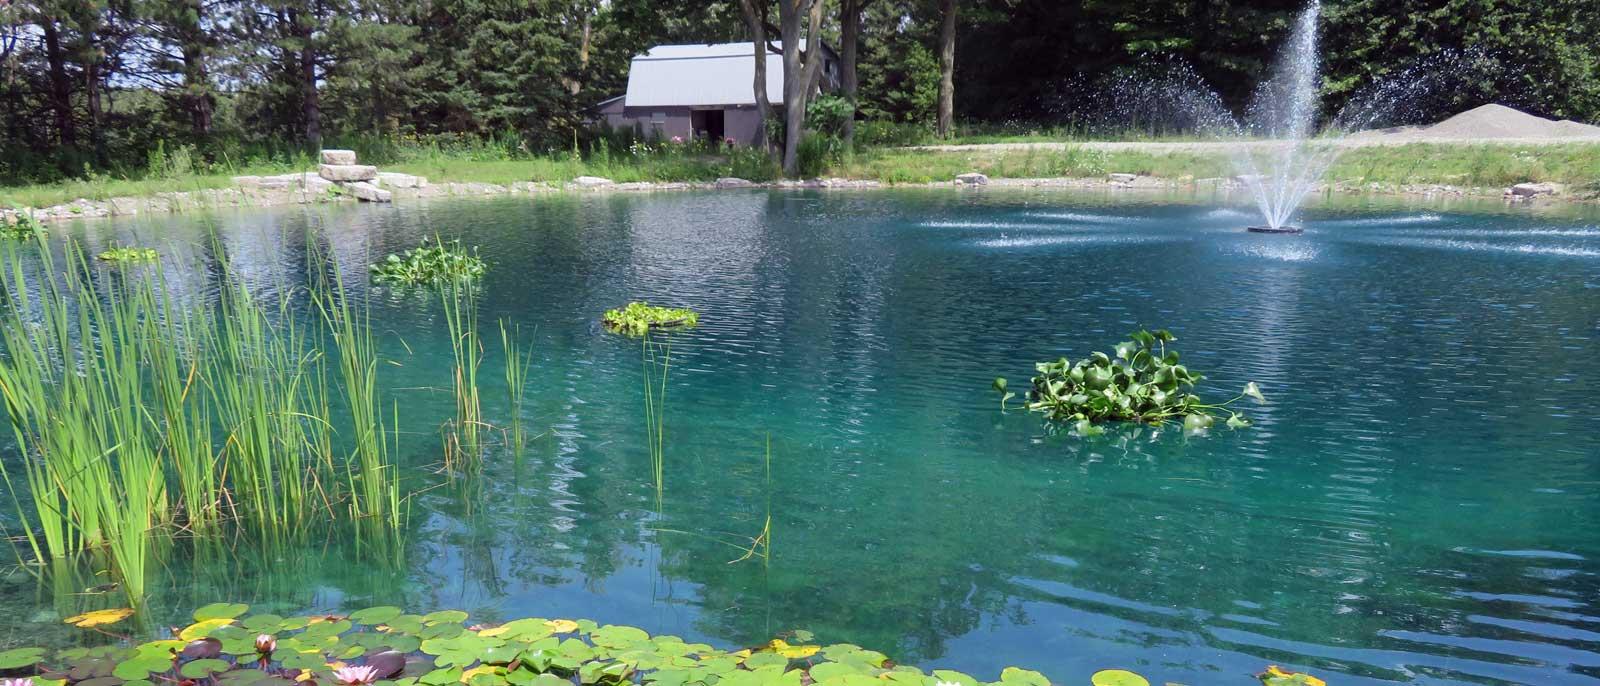 Floating Oxygenating Pond Plants